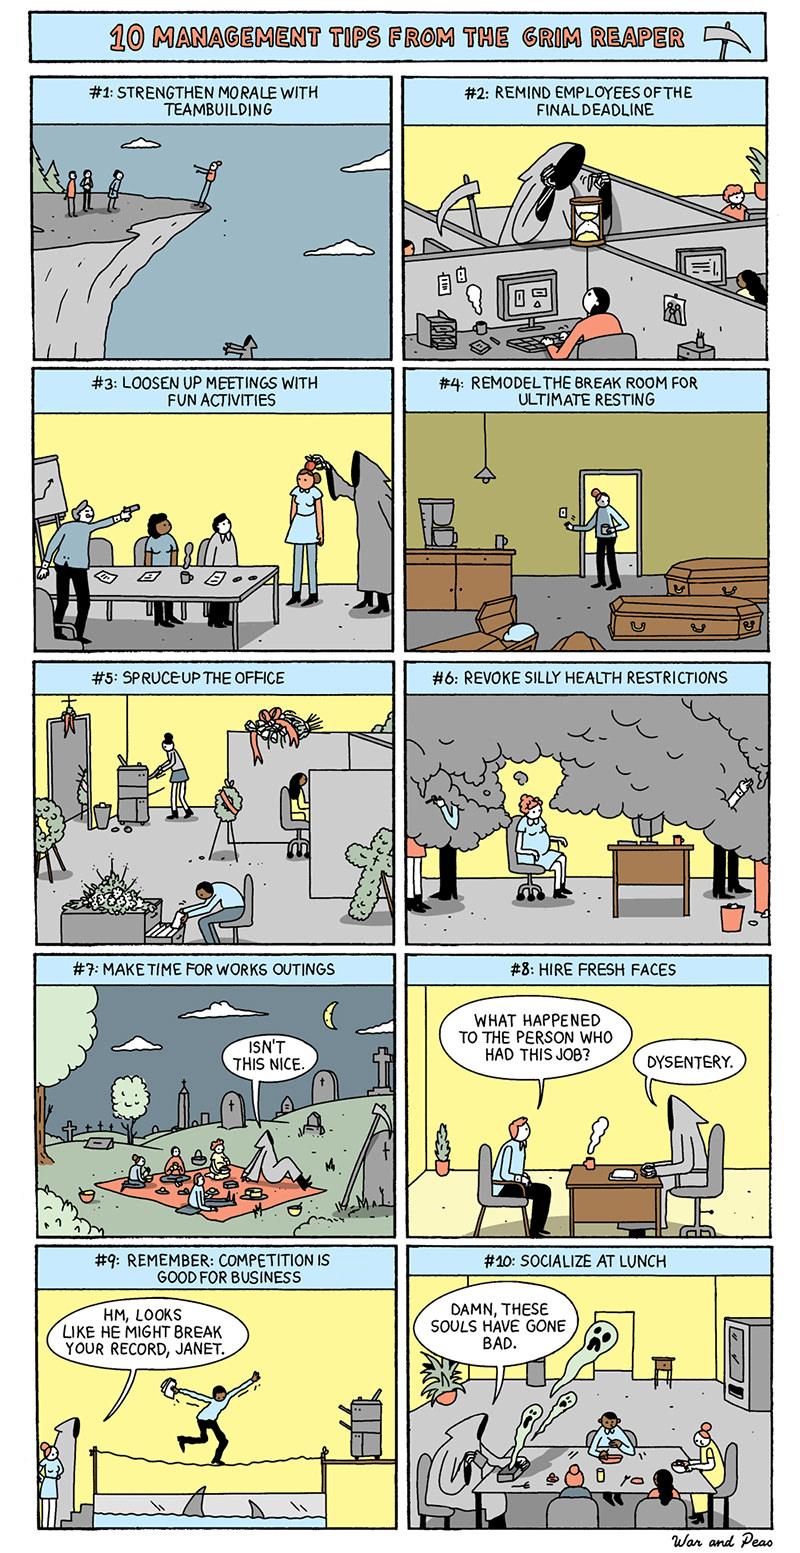 time-management-tips-grimreaper